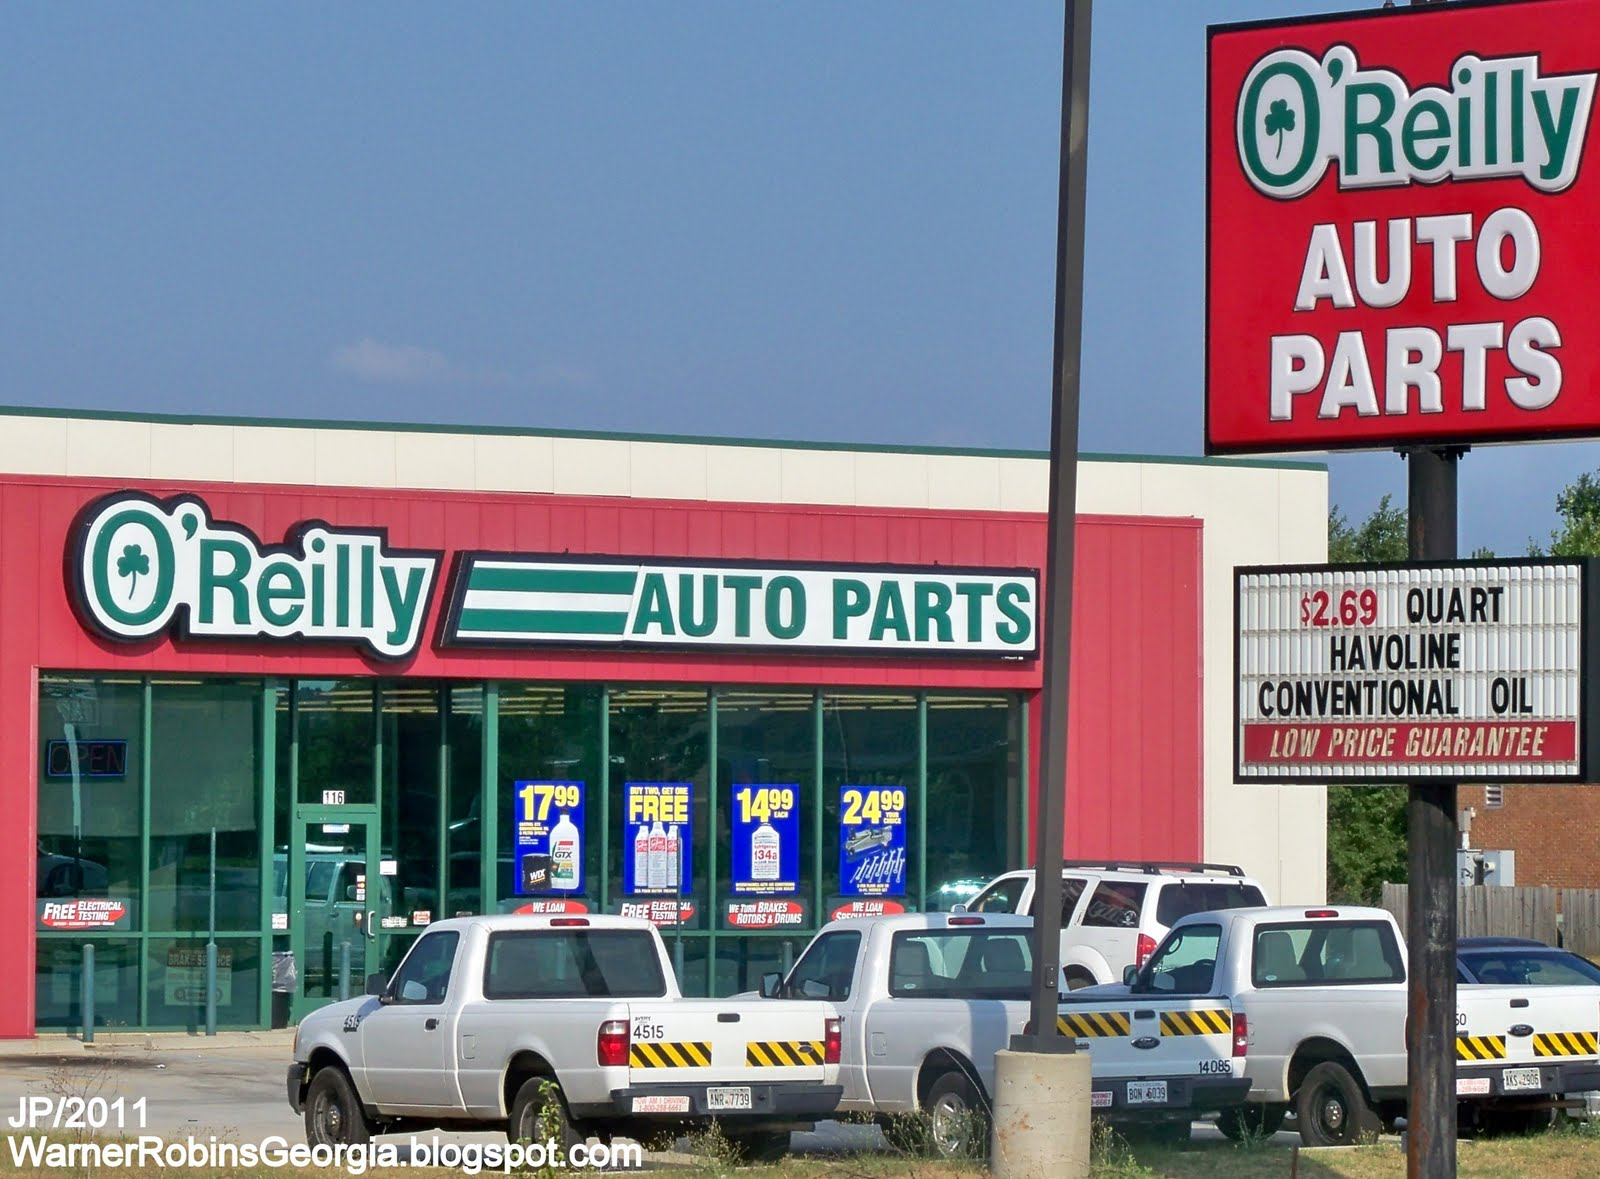 O reilly auto parts warner robins georgia houston lake road o reilly auto parts supply store warner robins houston county ga